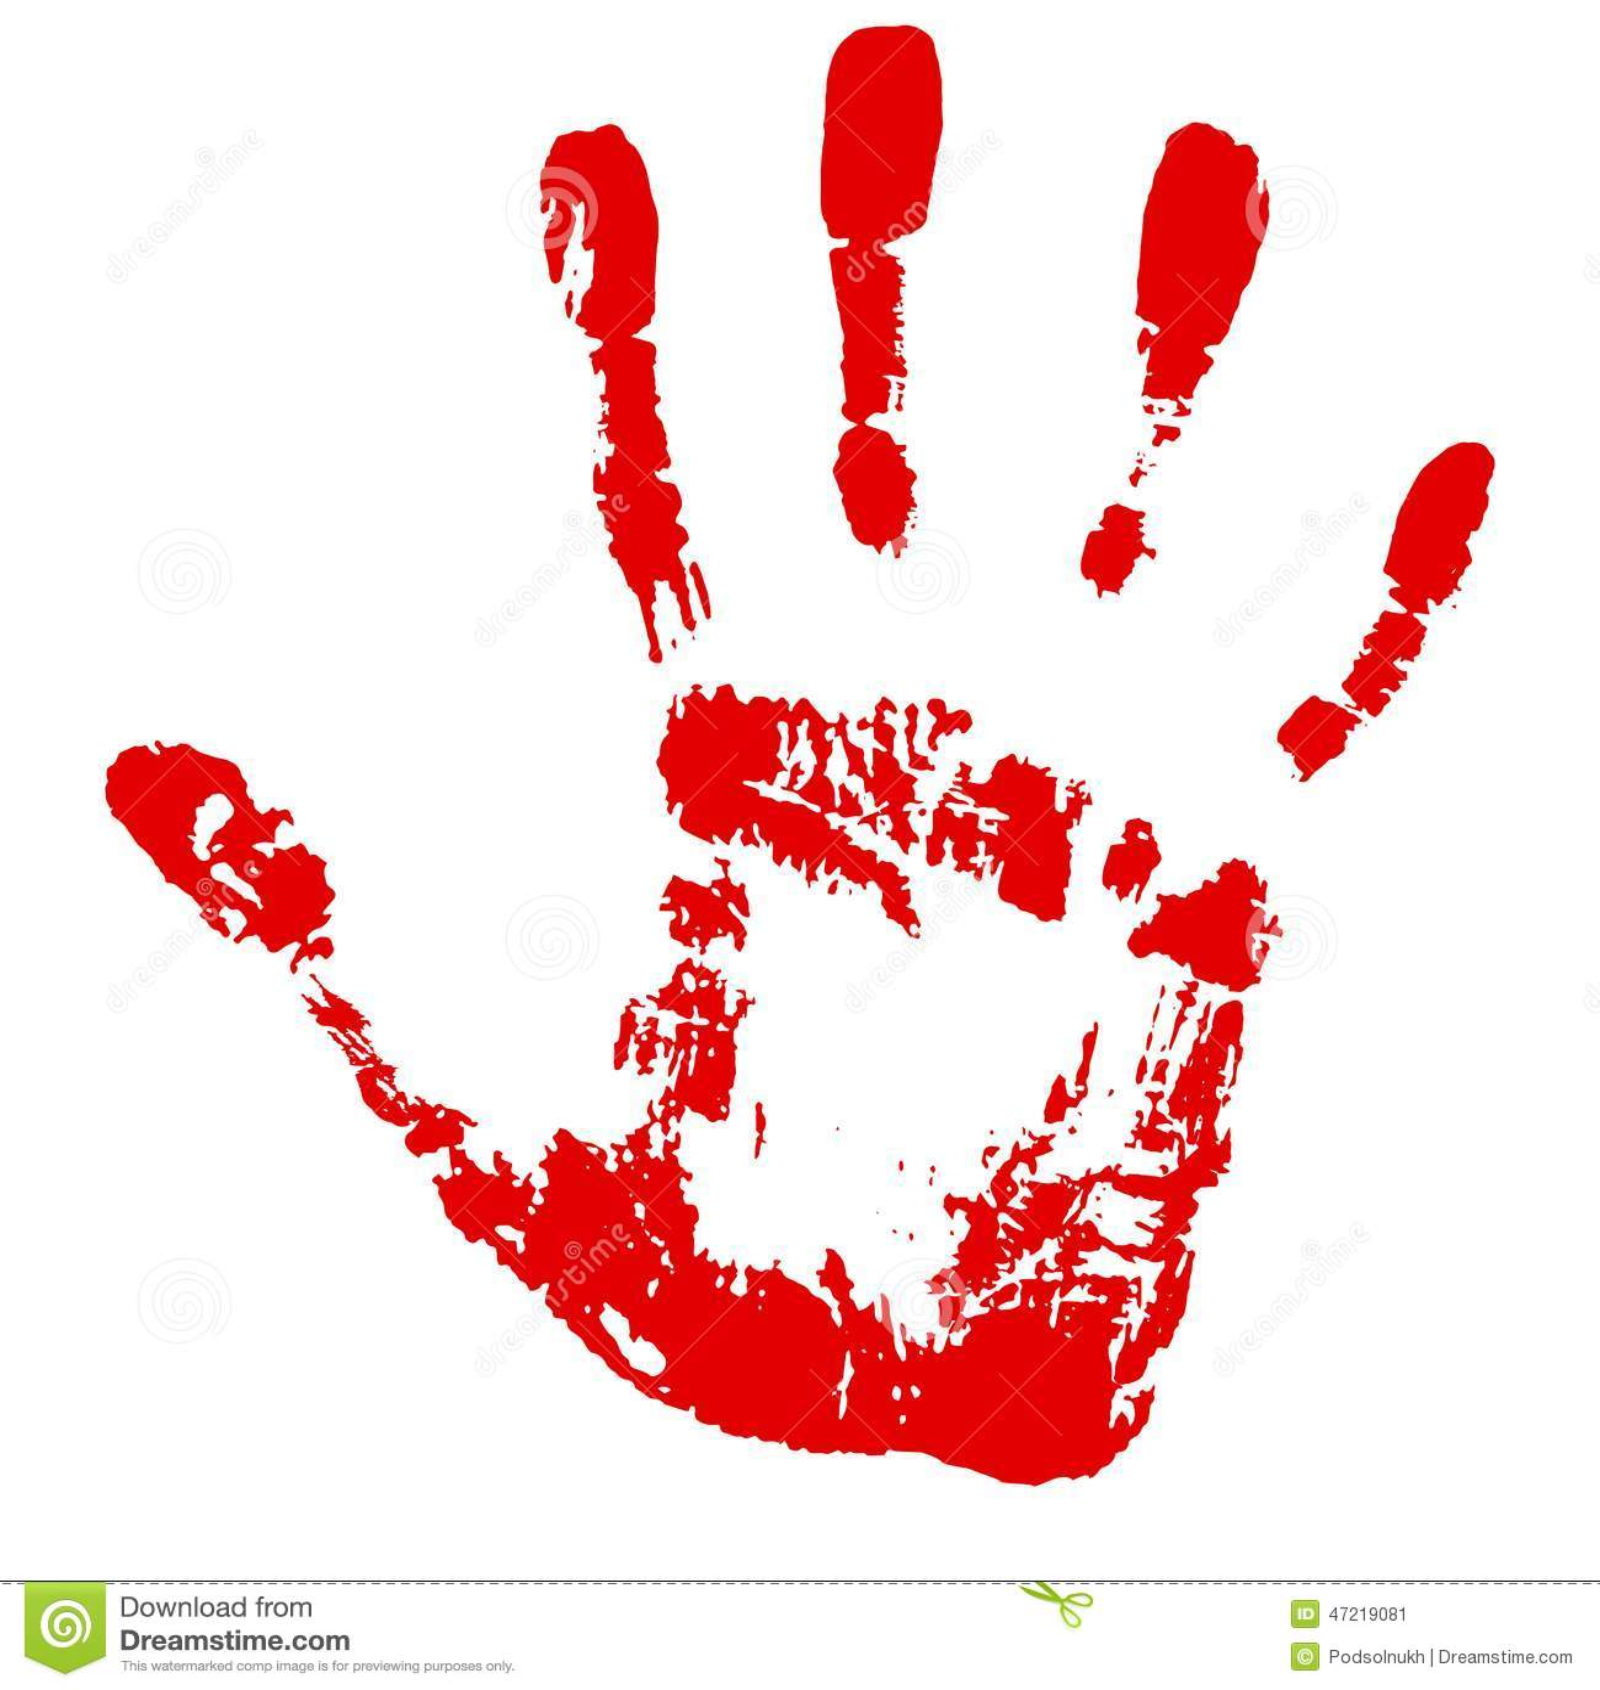 Footprint hand tools uk